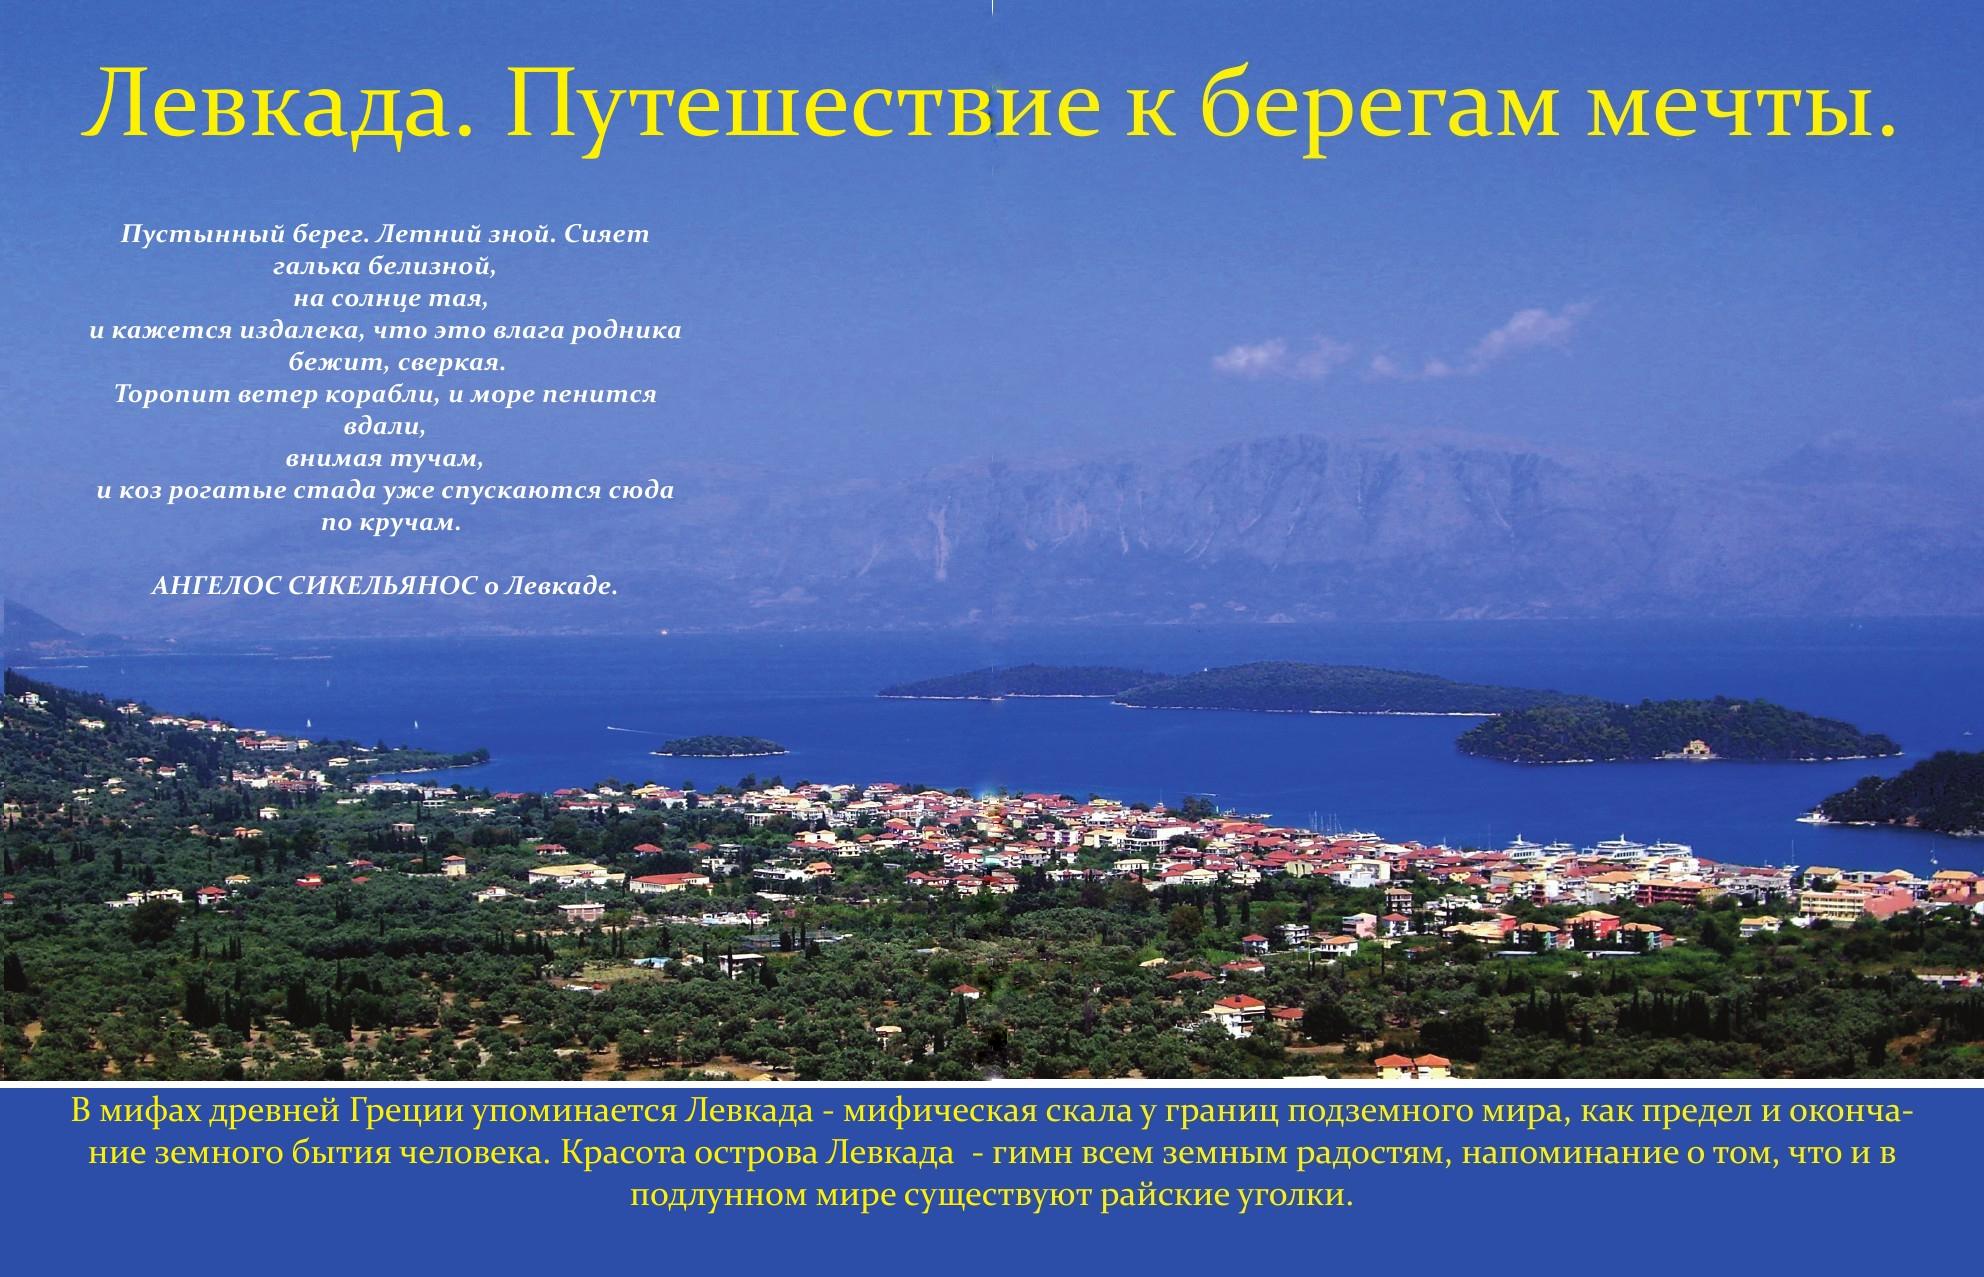 levkada-2-2.jpg